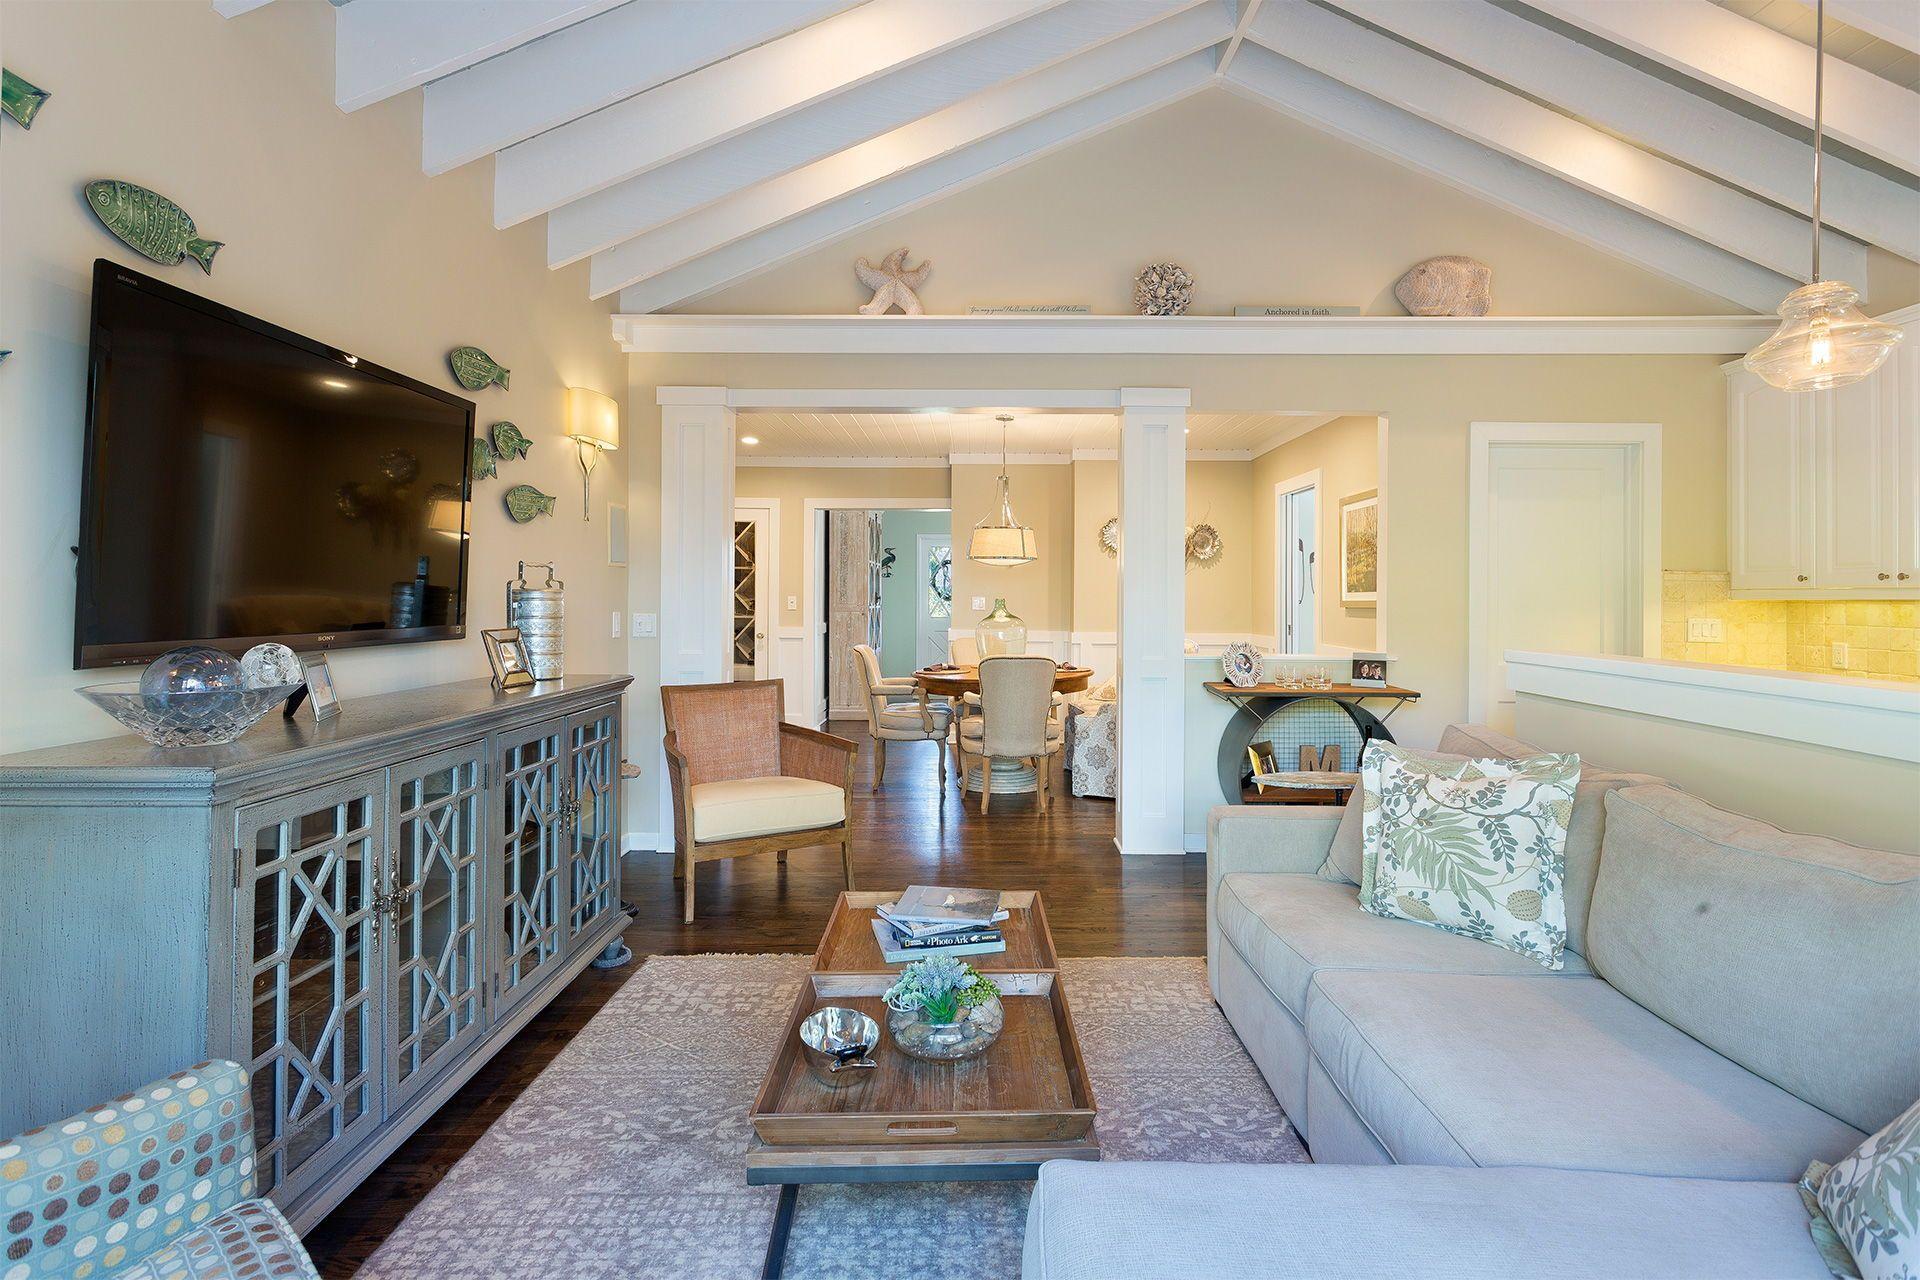 Pin On 105 Northeast 7th Street Delray Beach Florida Charming Modern Cottage